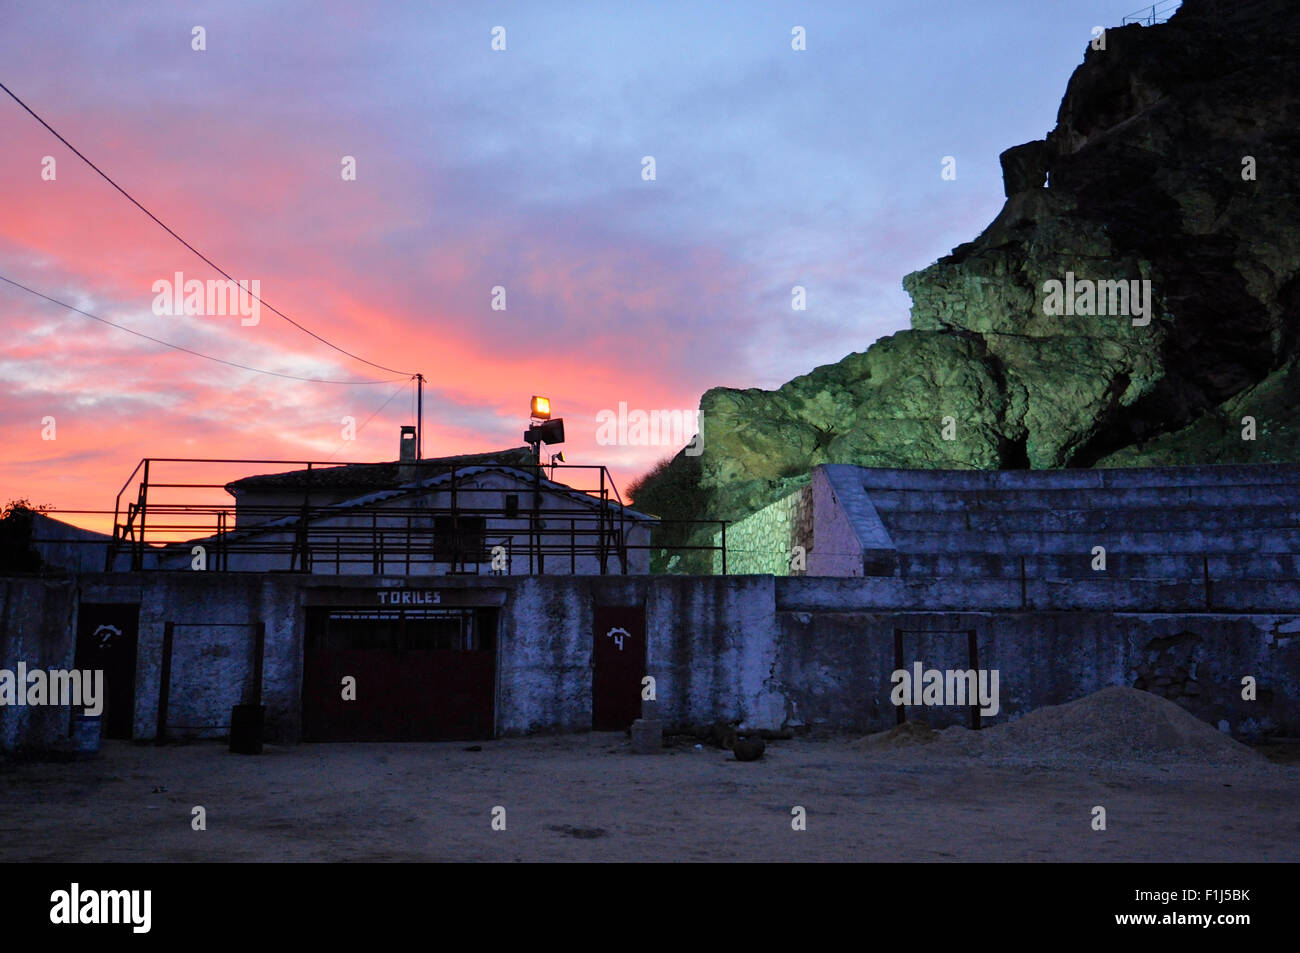 Sunset at Huélamo bullring (Huélamo, Serranía de Cuenca, Cuenca) - Stock Image